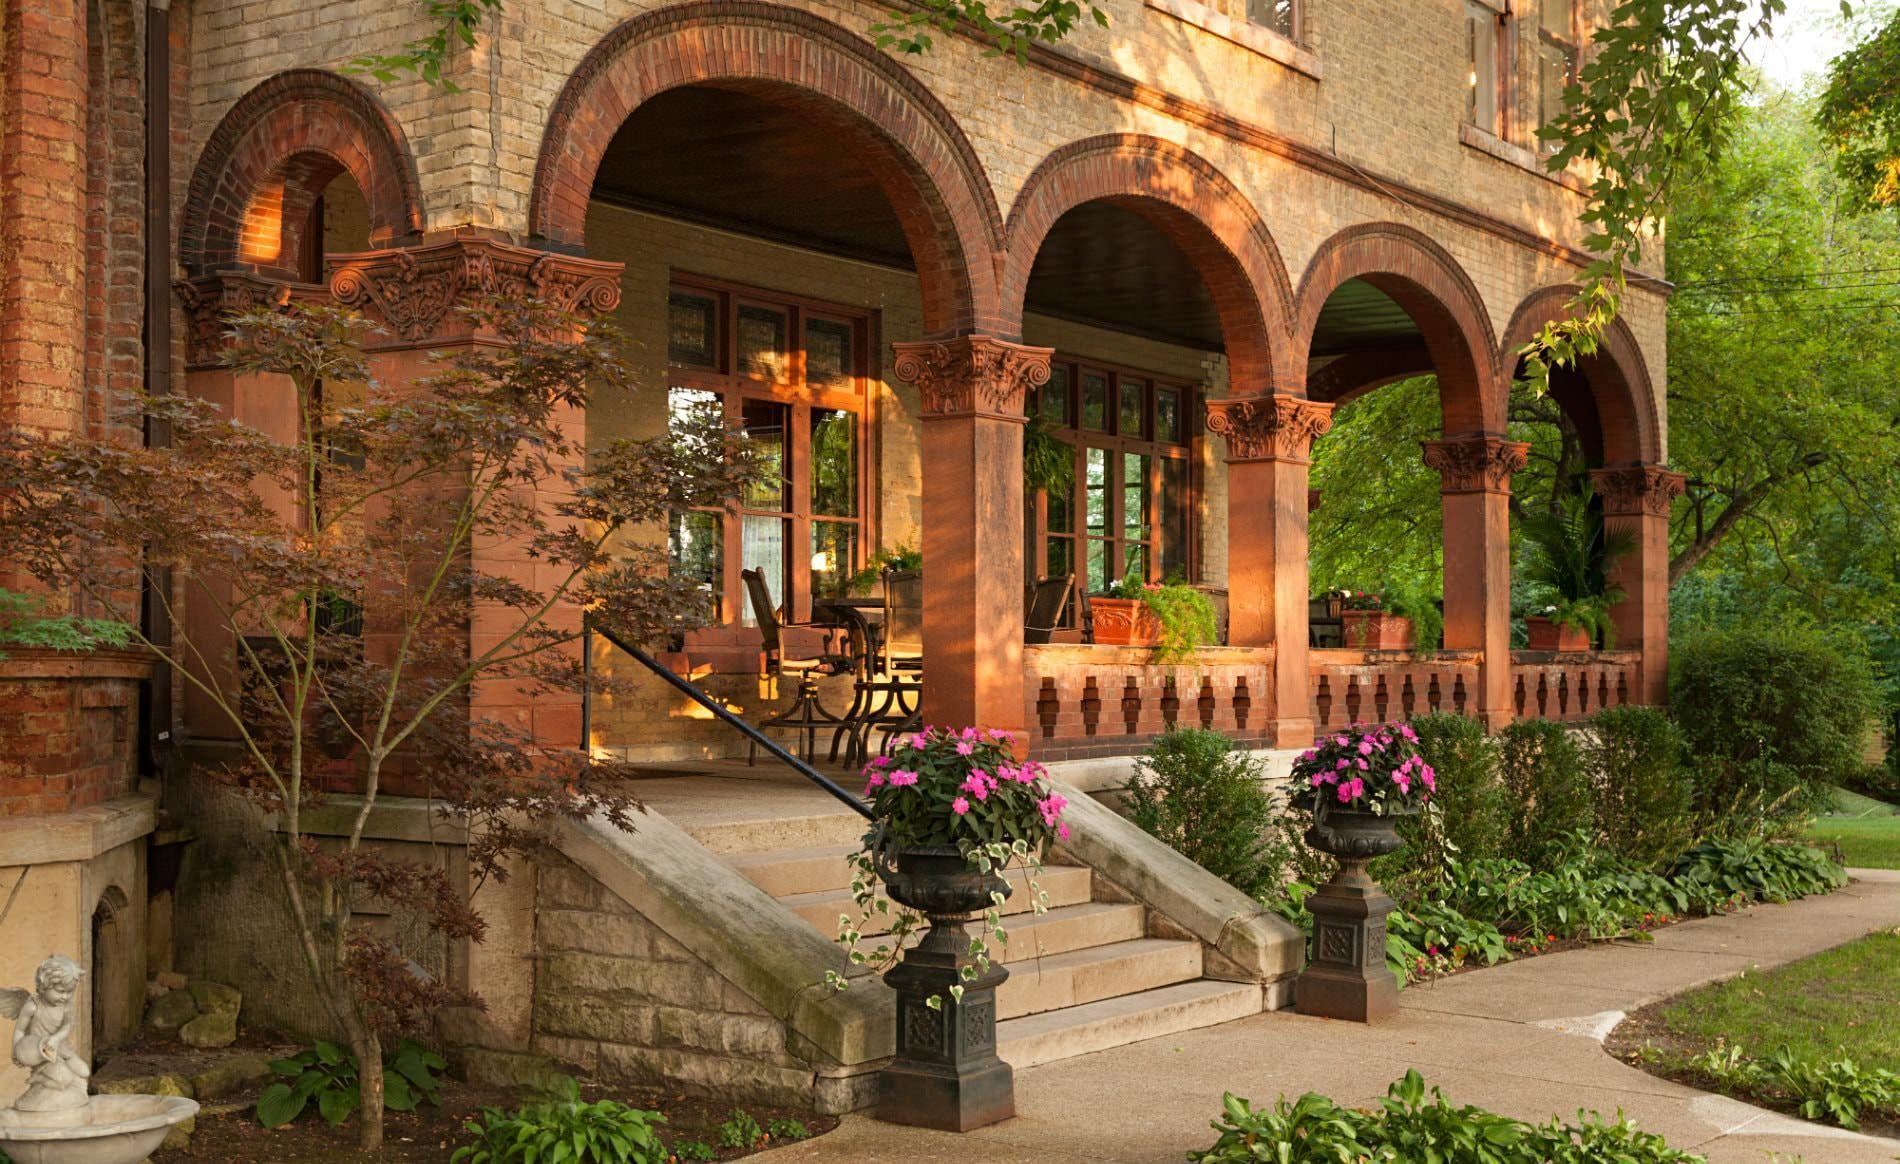 Vrooman Mansion, a historic Bed & Breakfast near